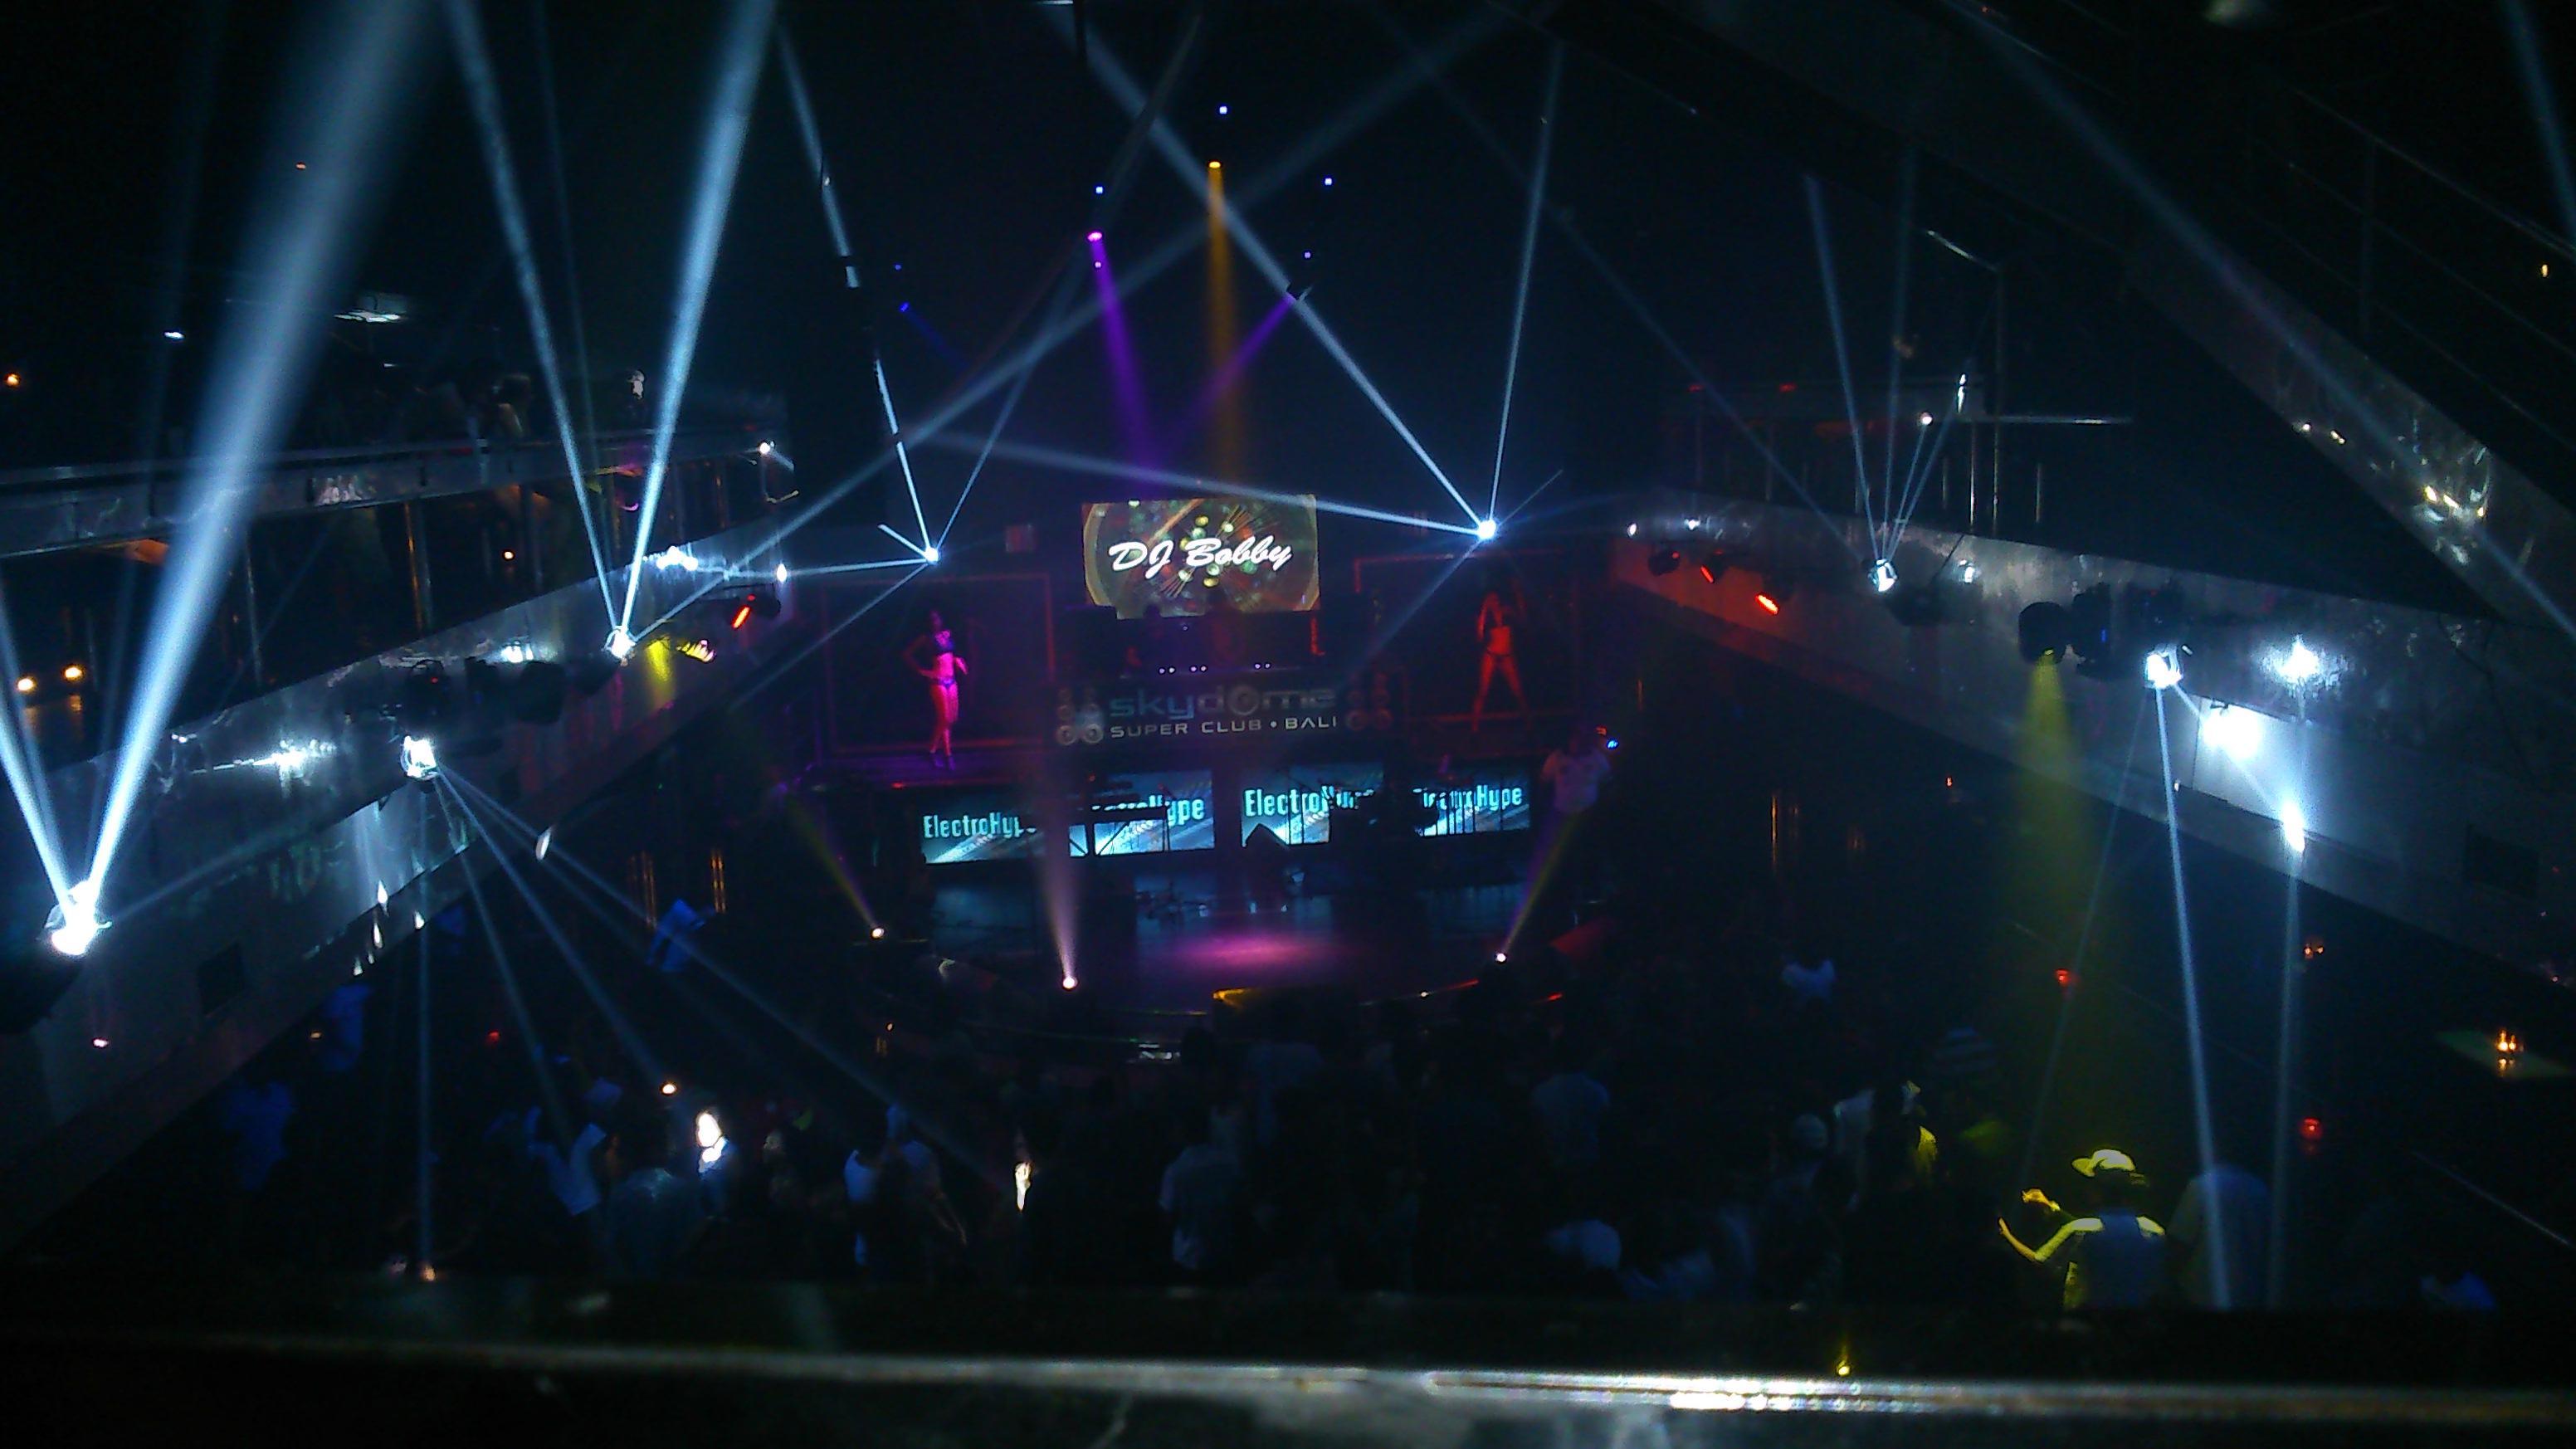 Legian night club